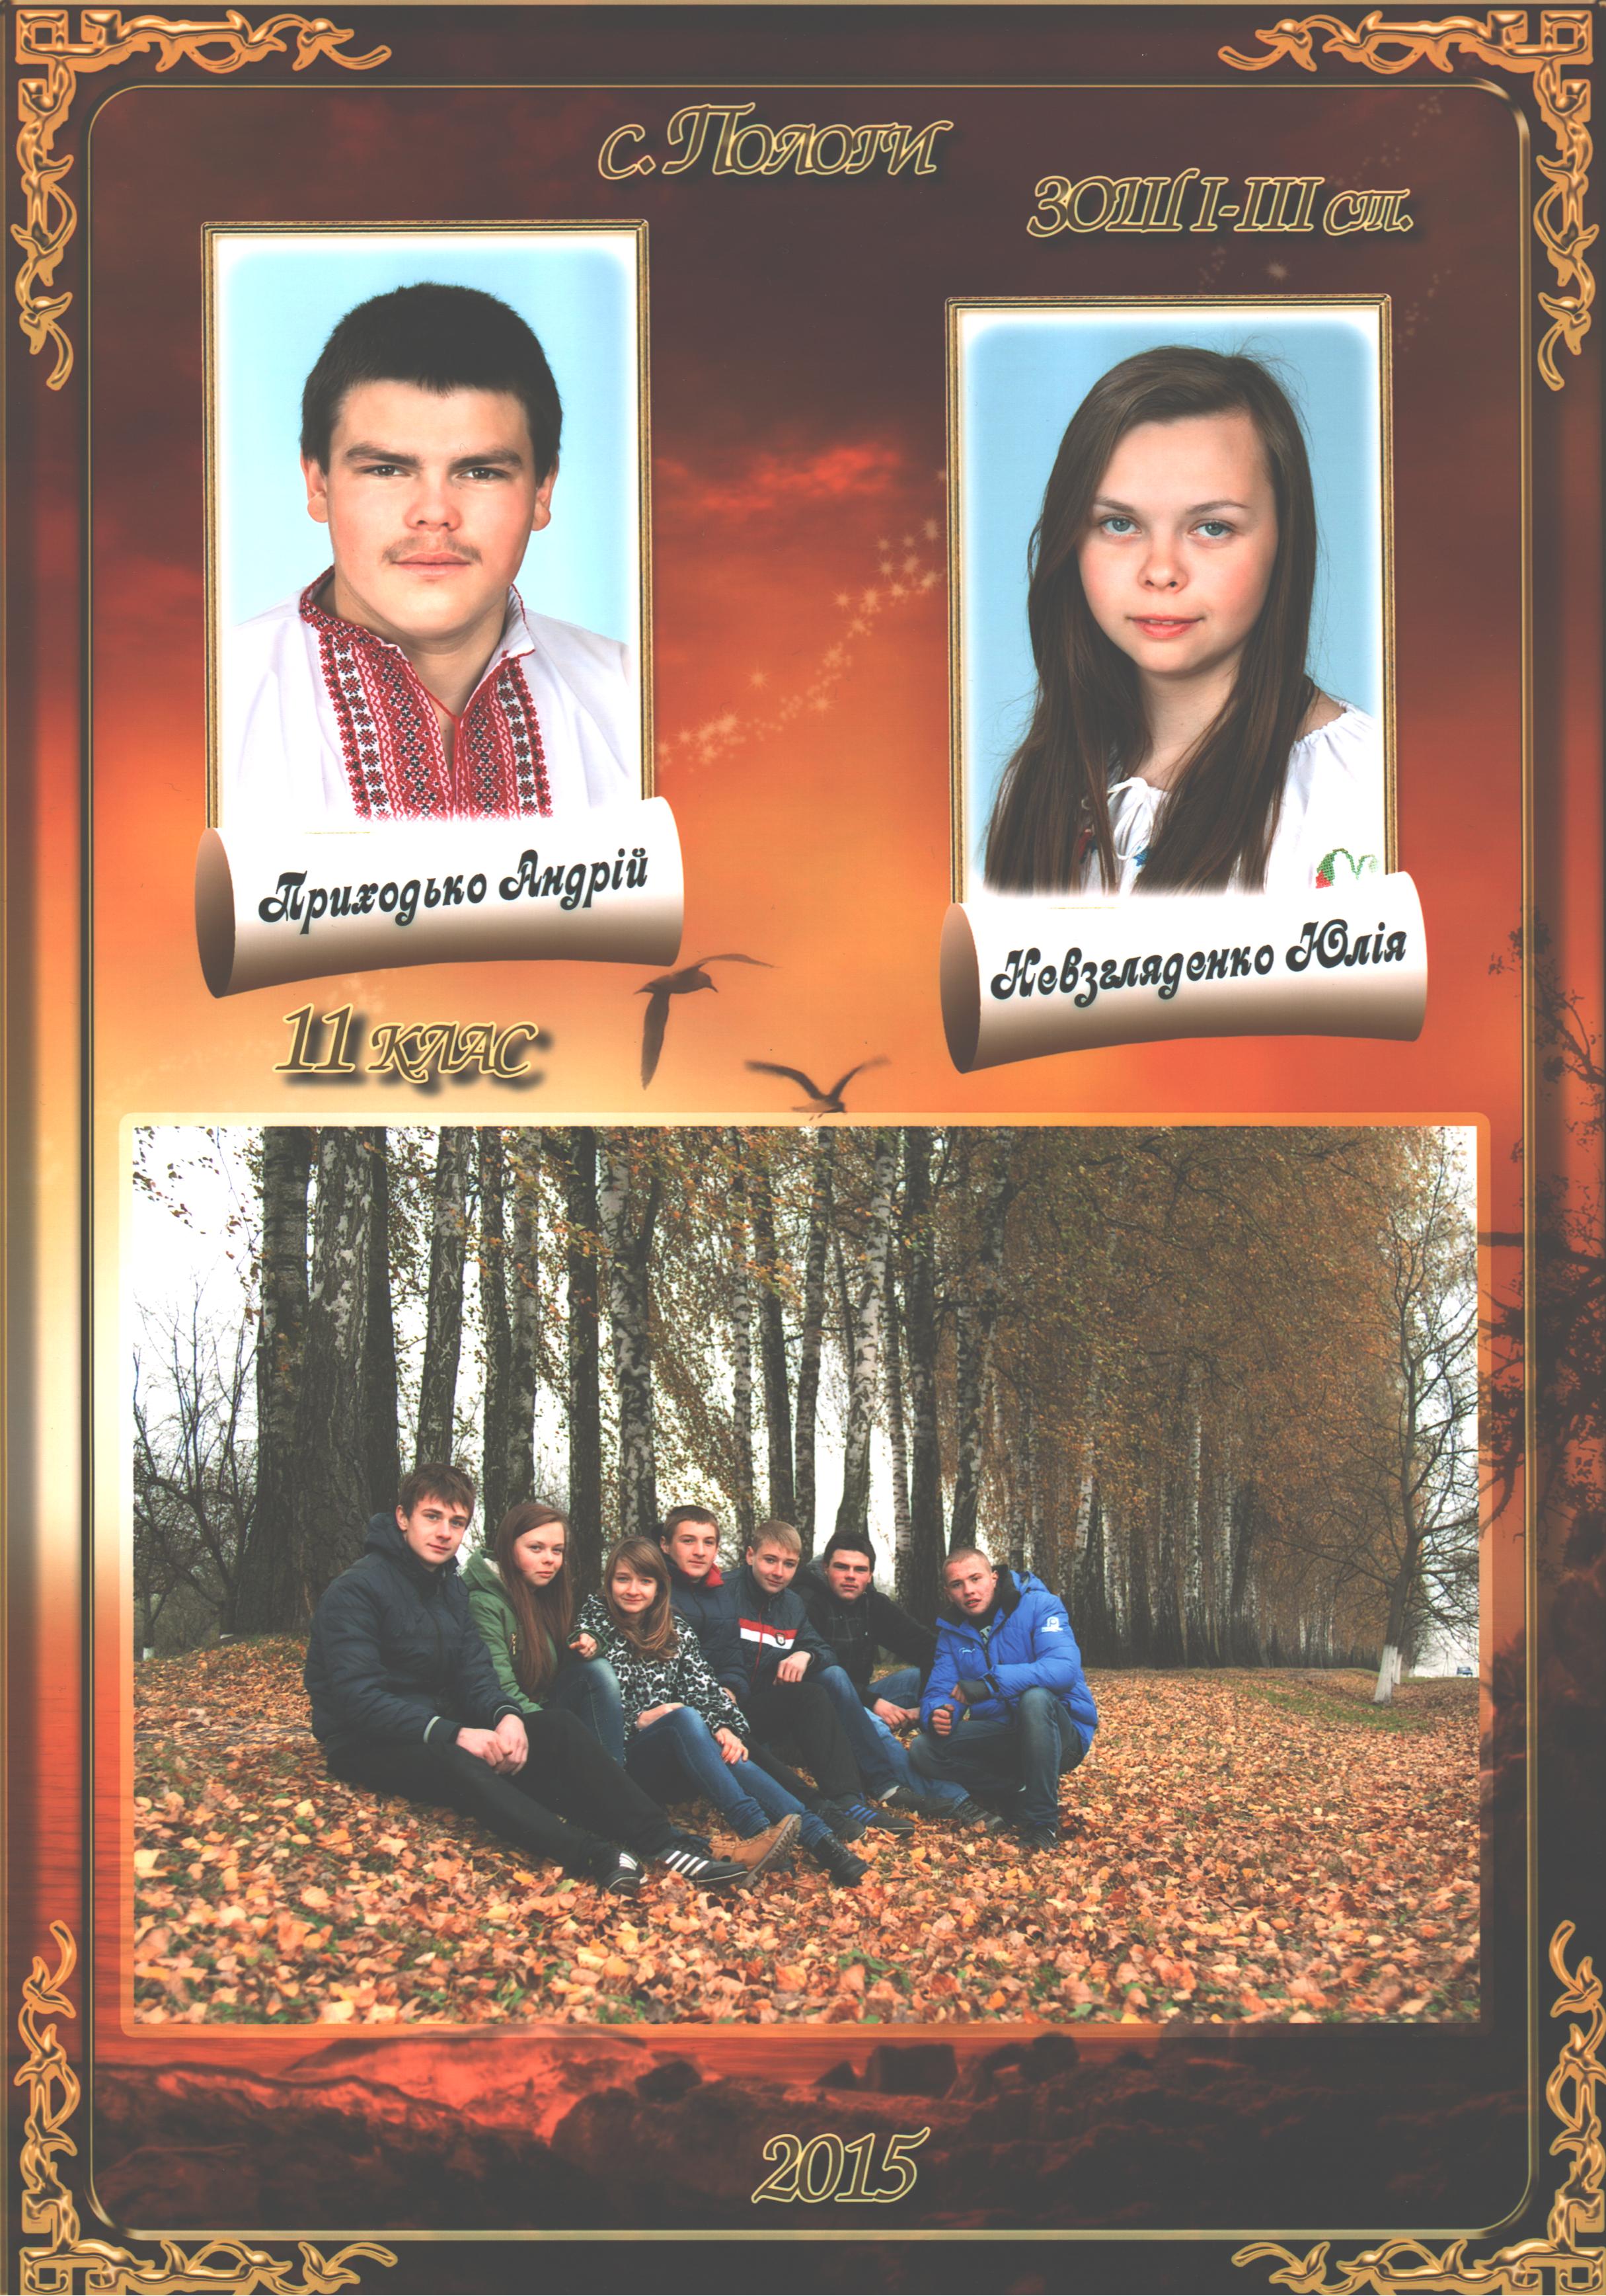 11 клас 3 Випуск 2015 (11 клас)